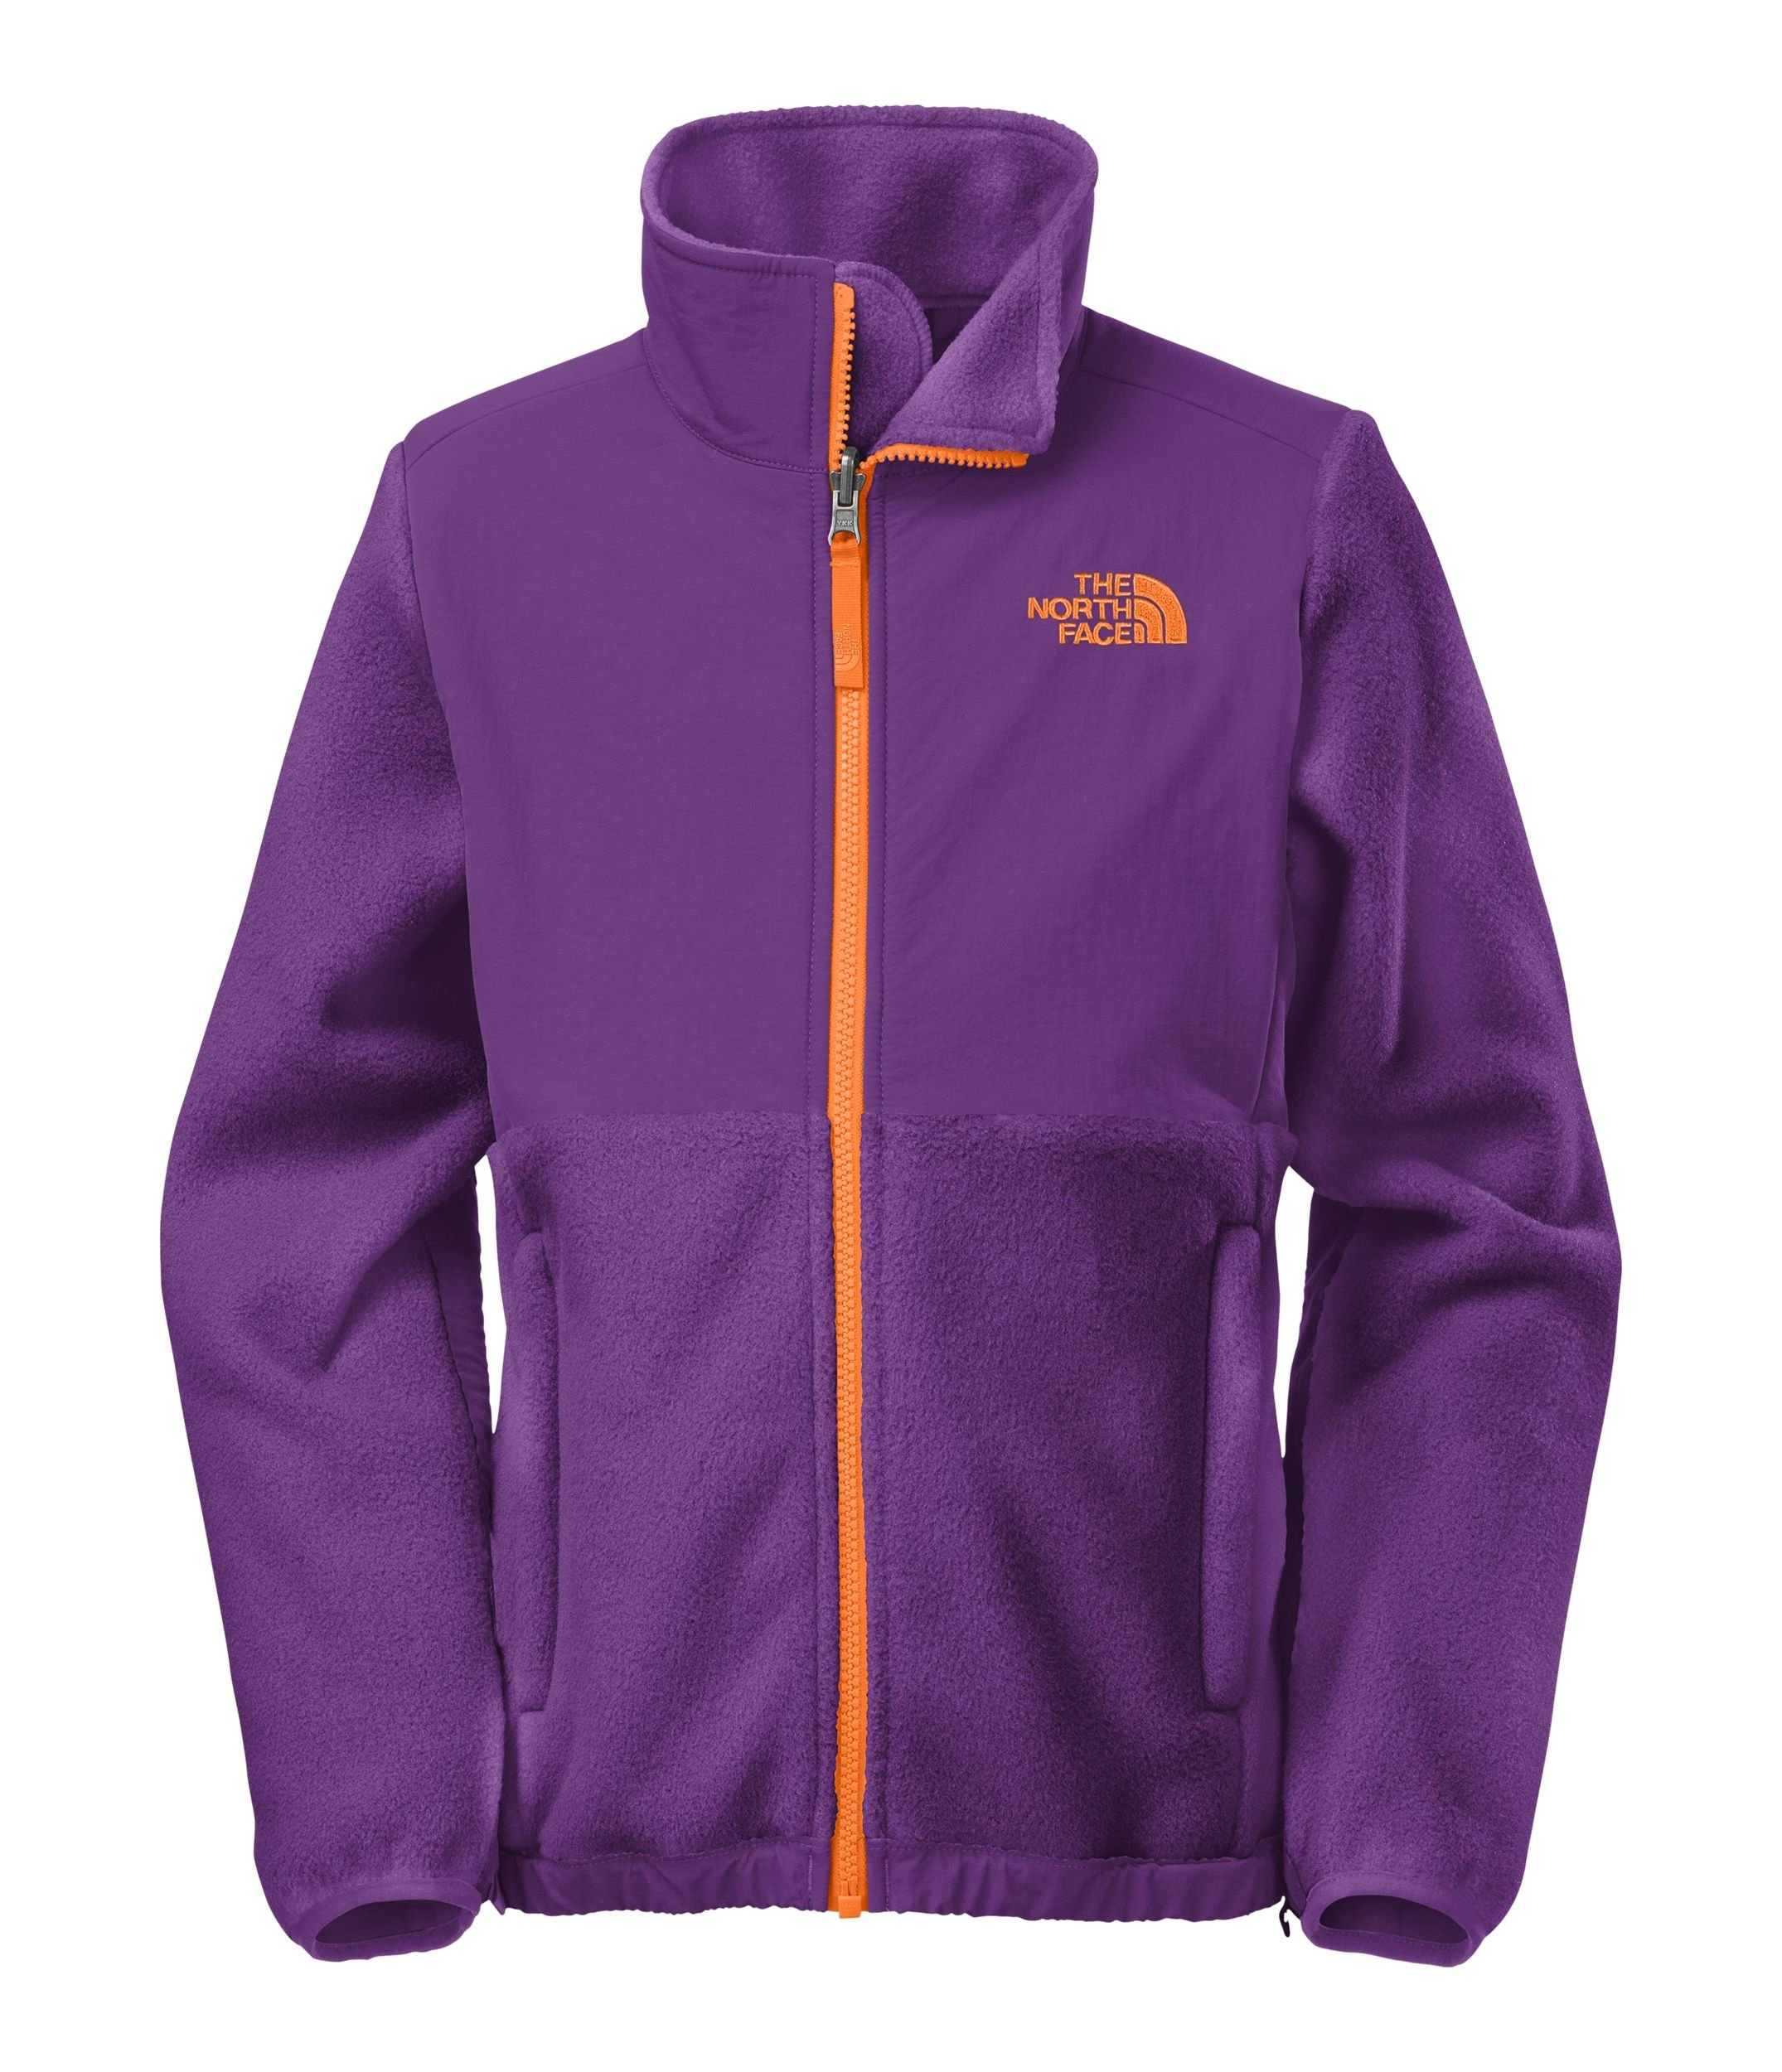 North Face Denali Jacket Big Kids Style : Cdb5 by The North Face